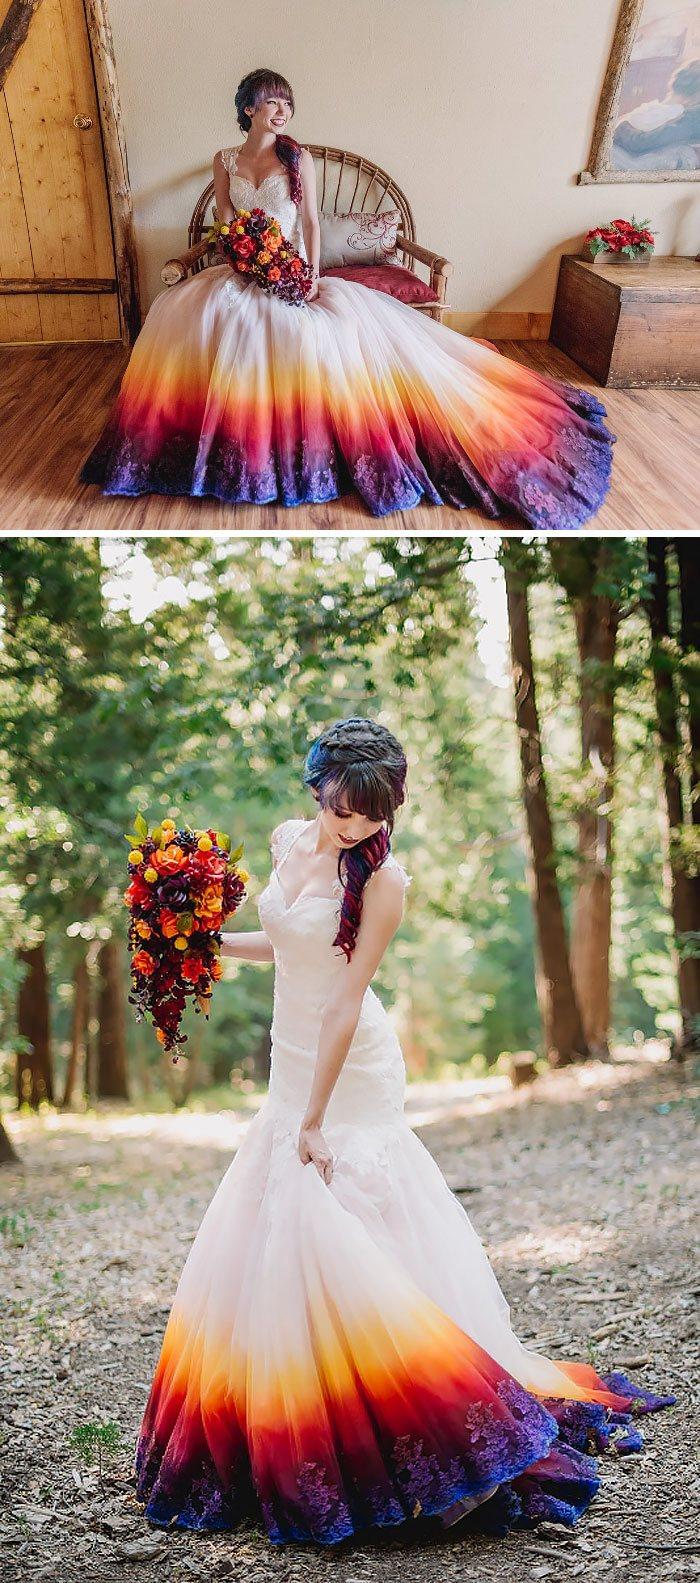 Dip-dyed purple dress.